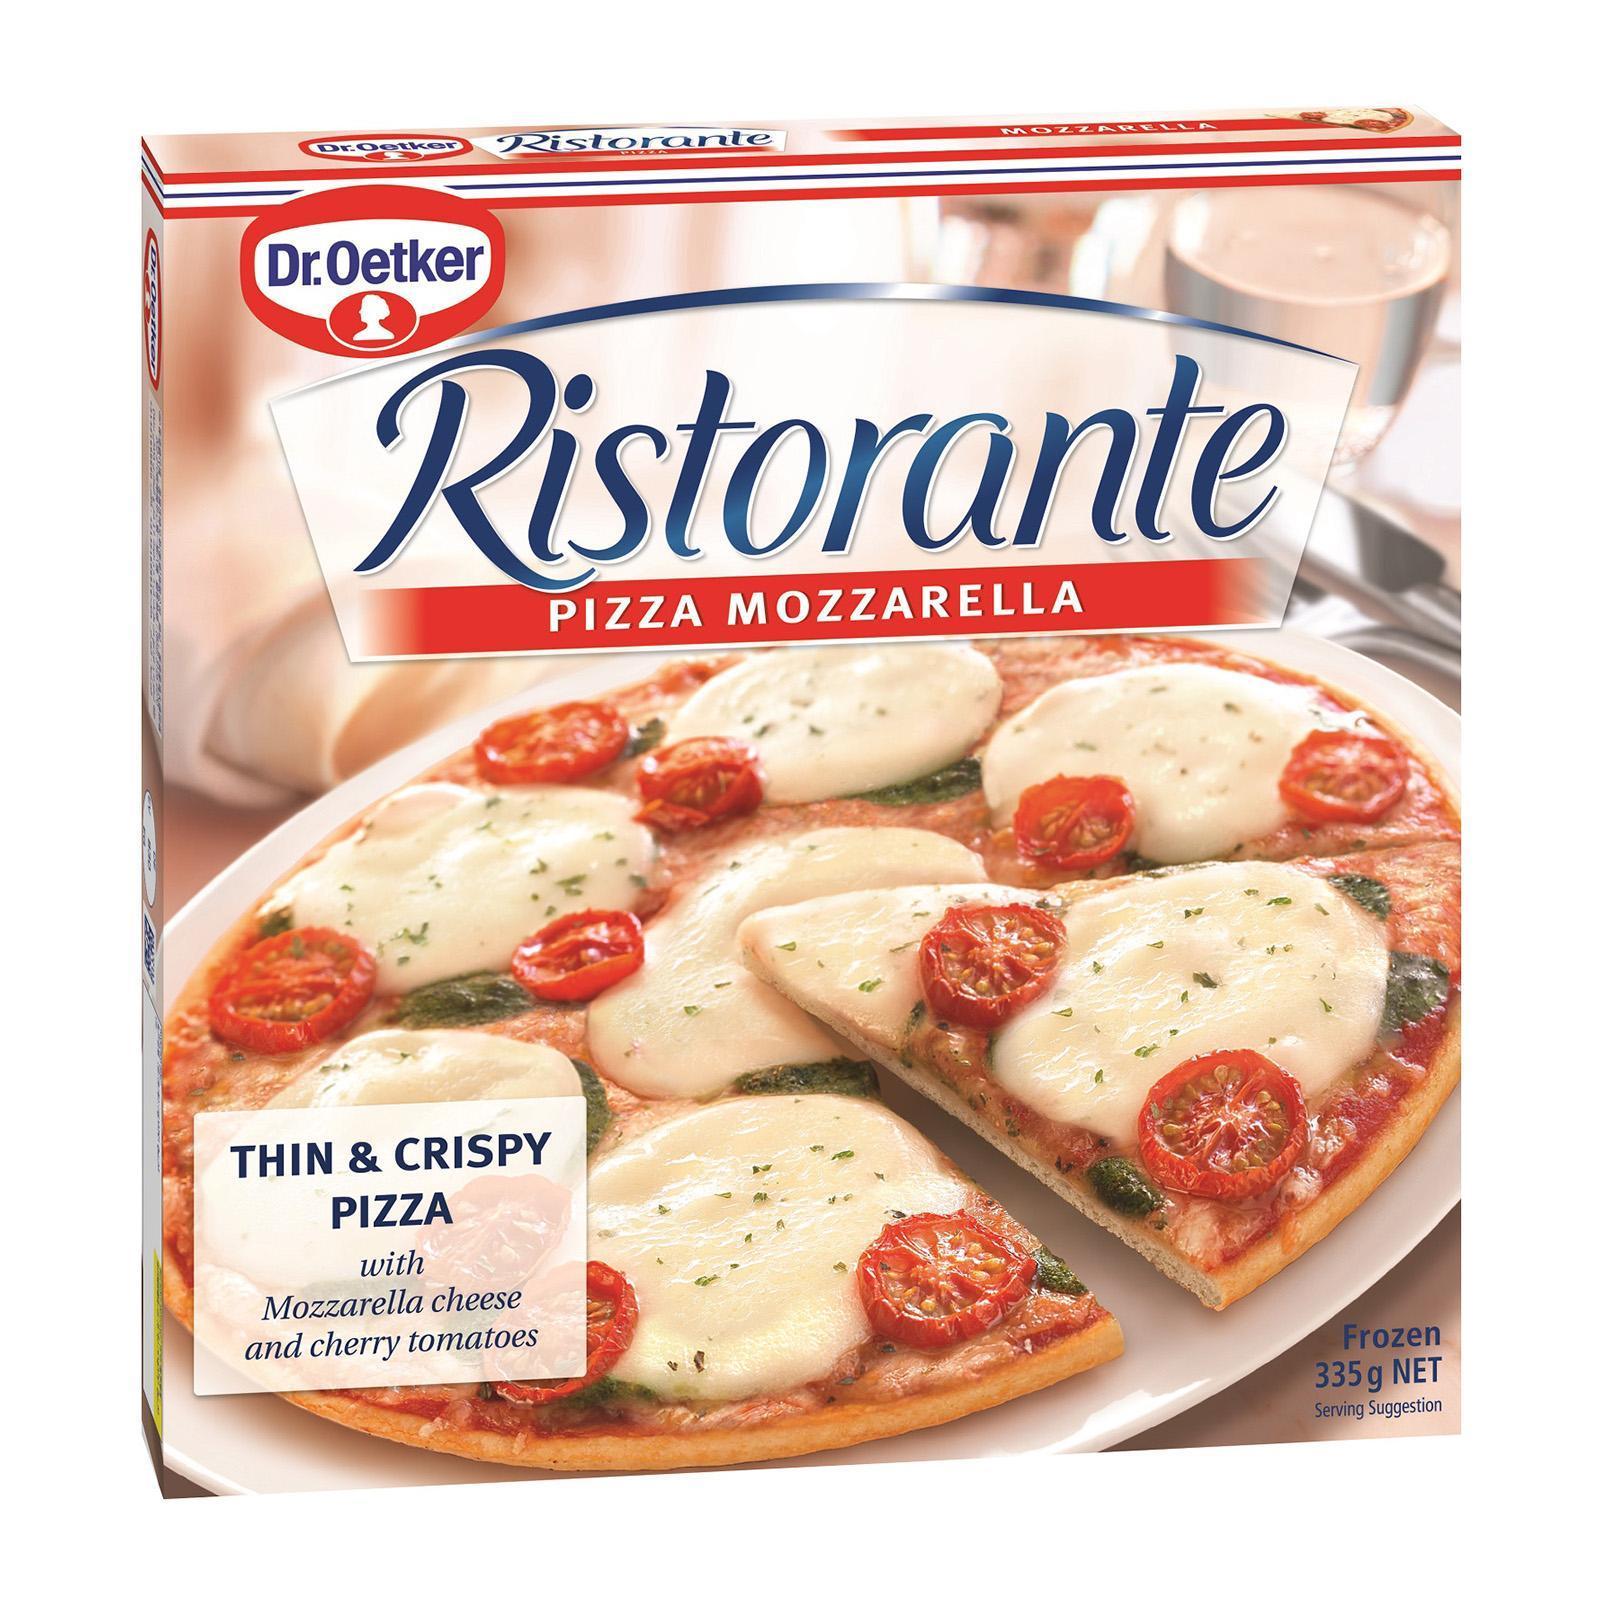 Dr Oetker Ristorante - Mozzarella - Frozen By Redmart.